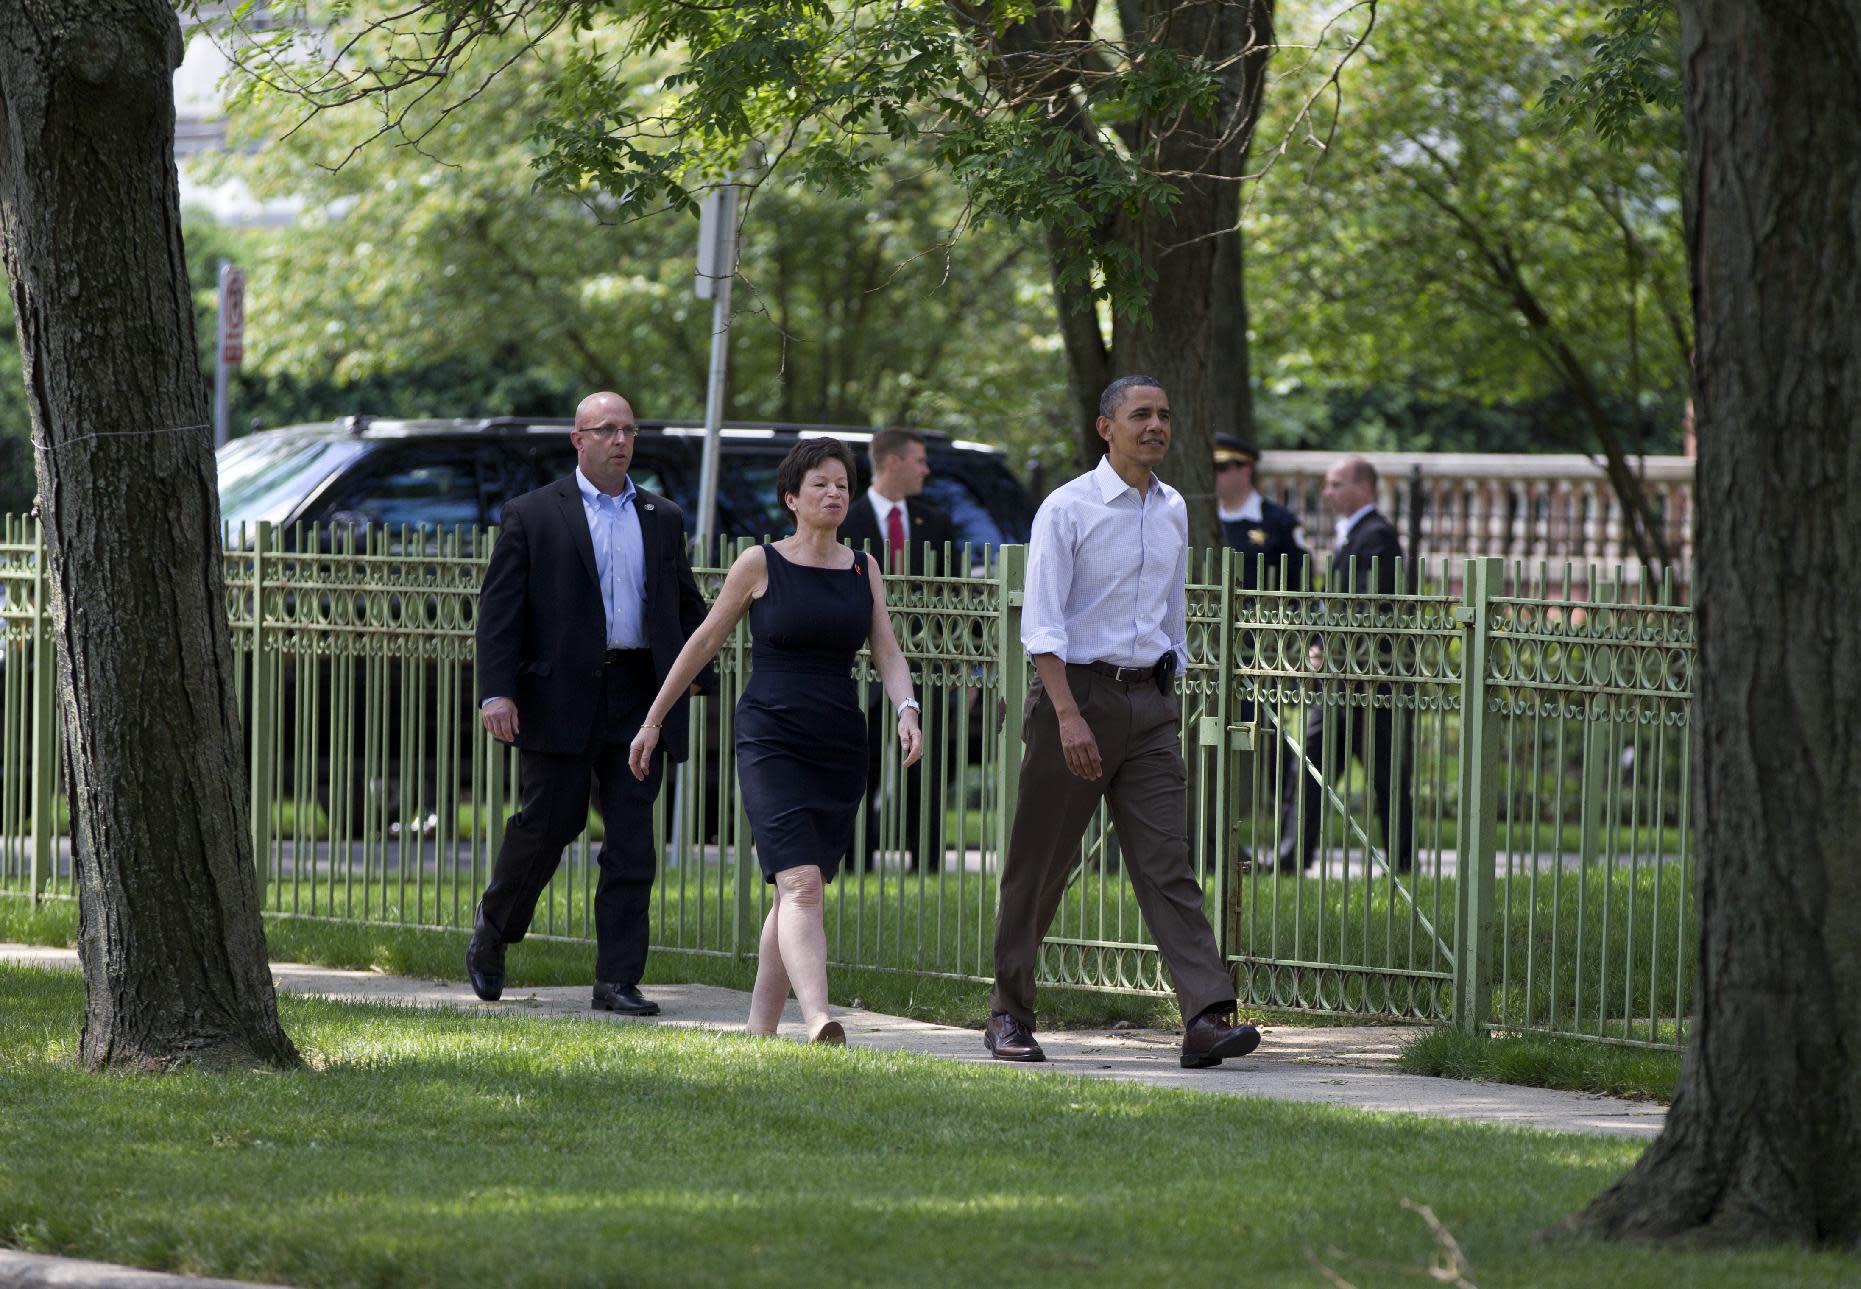 President Barack Obama walks through his Hyde Park neighborhood with senior advisor Valerie Jarrett to his friend, Marty Nesbitt's home, Saturday, June 2, 2012, in Chicago. (AP Photo/Carolyn Kaster)